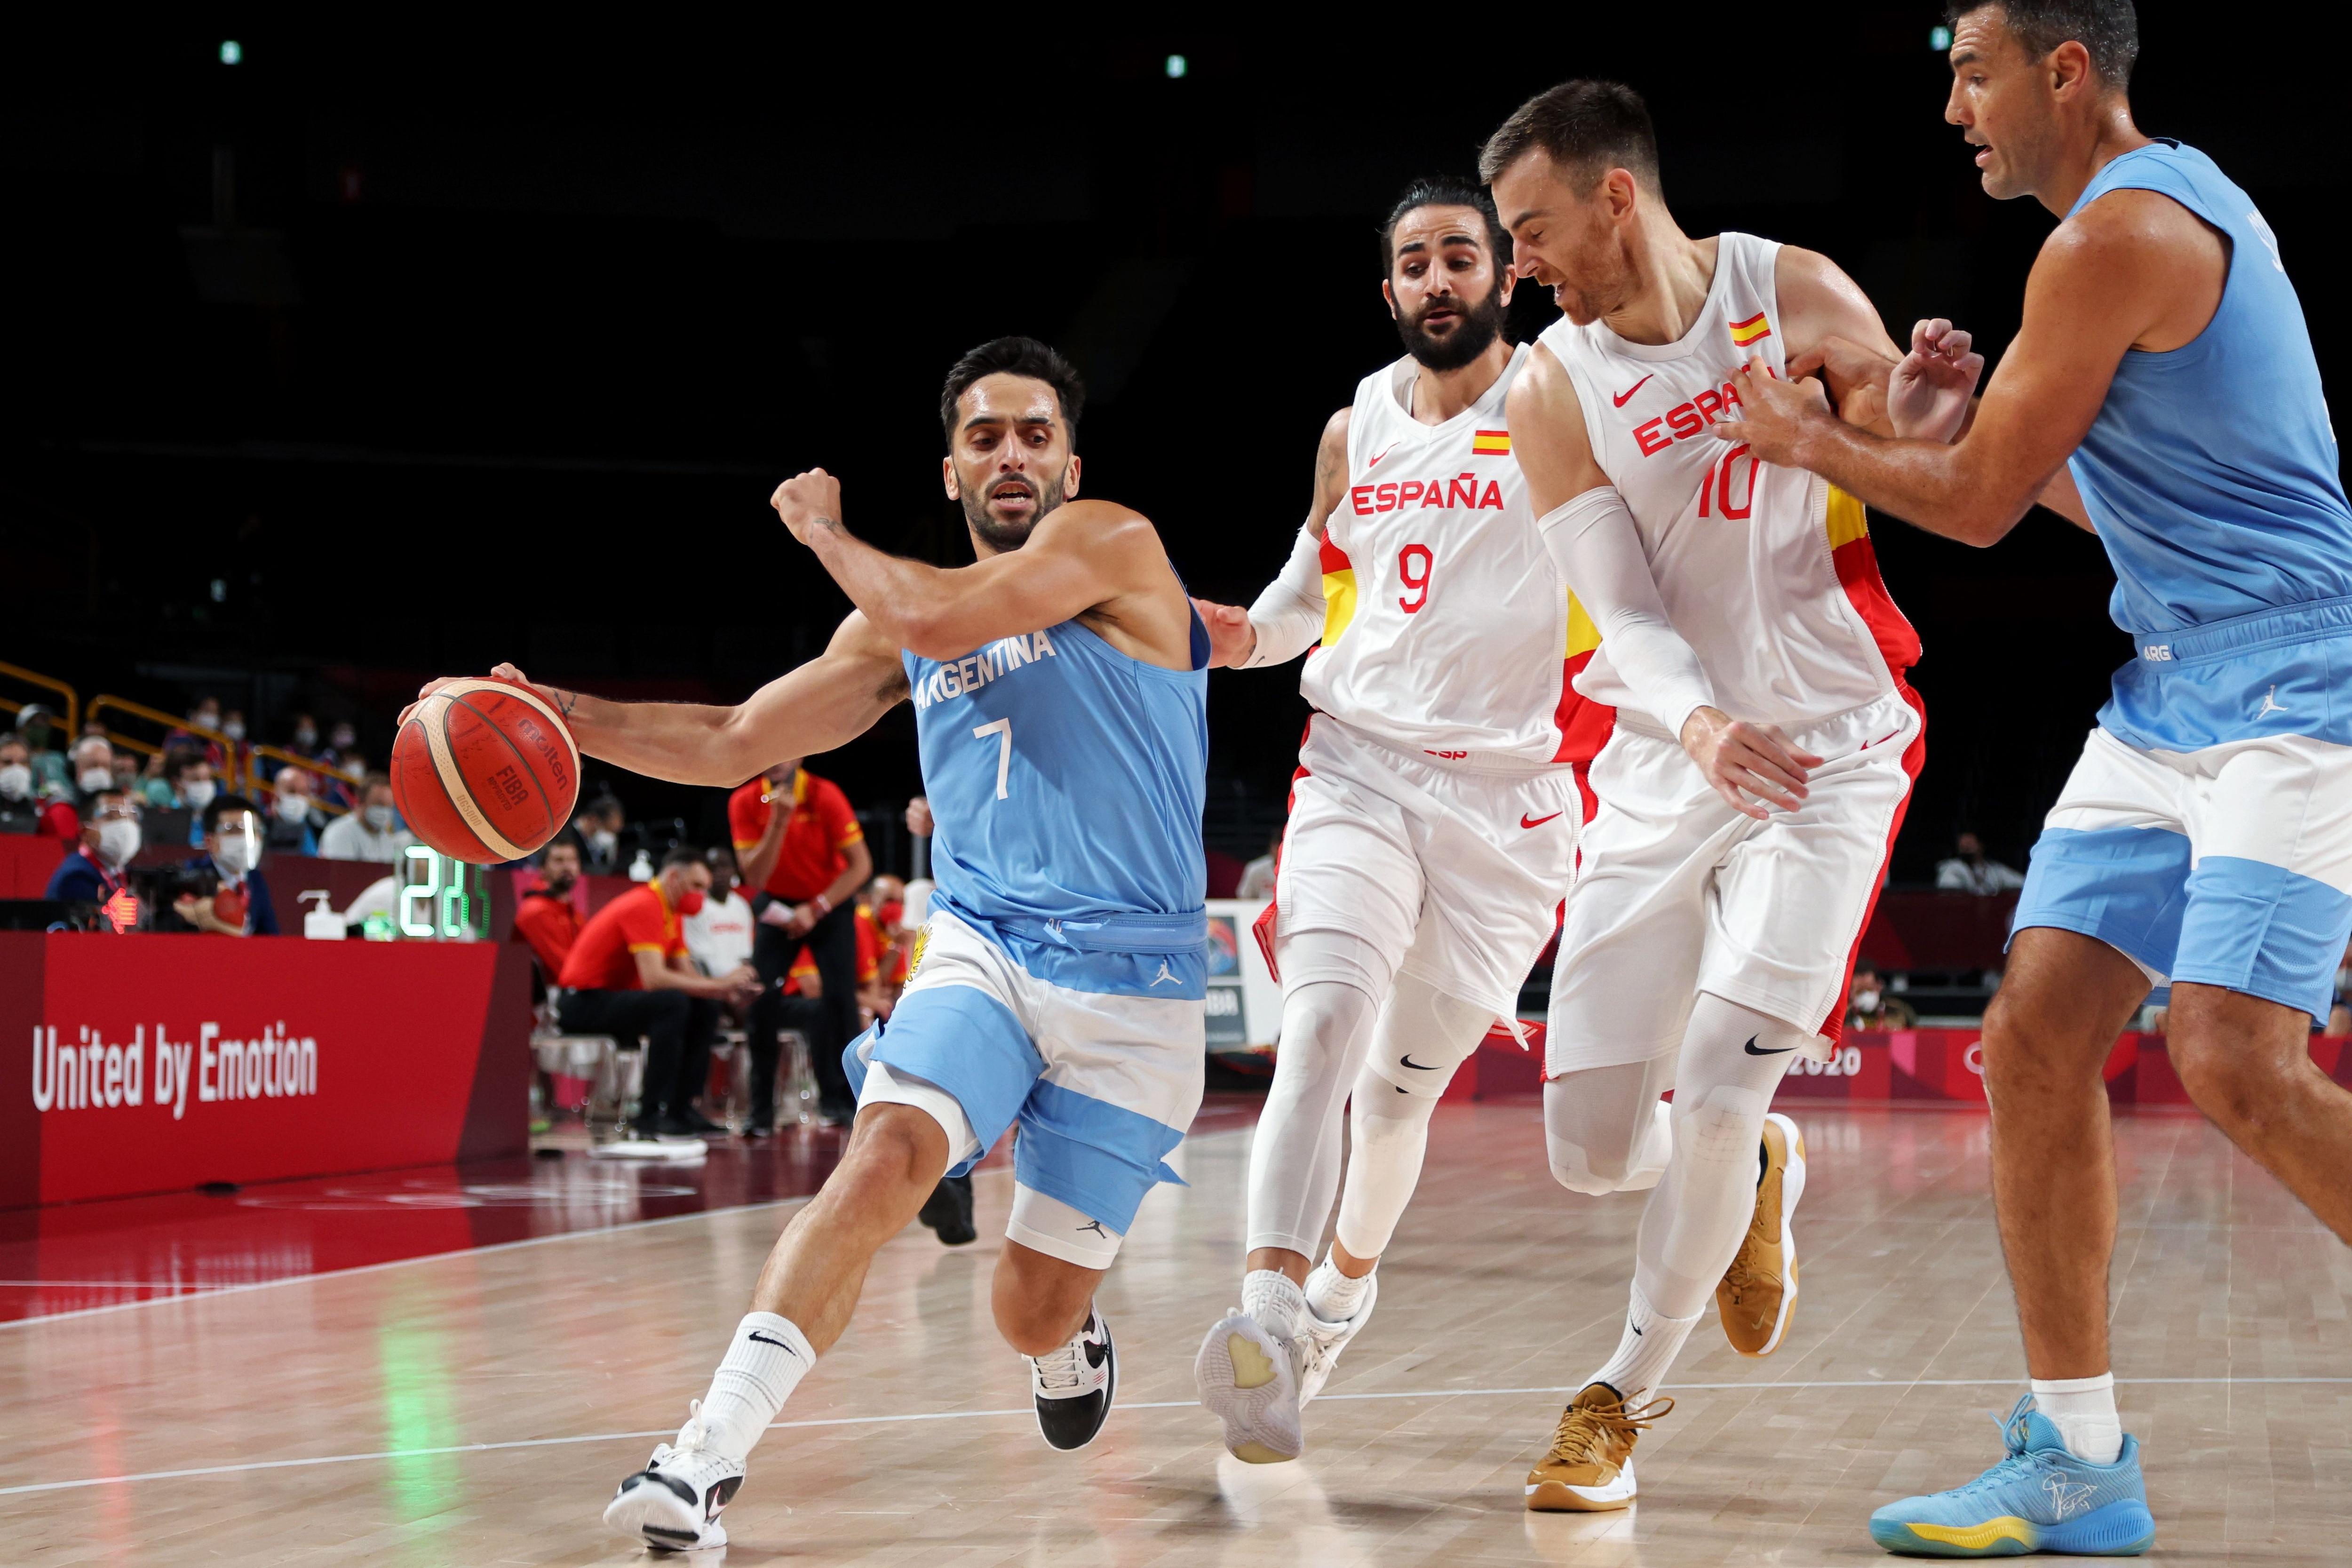 Argentina busca acomodarse dentro del Grupo C ante España (REUTERS/Alkis Konstantinidis)